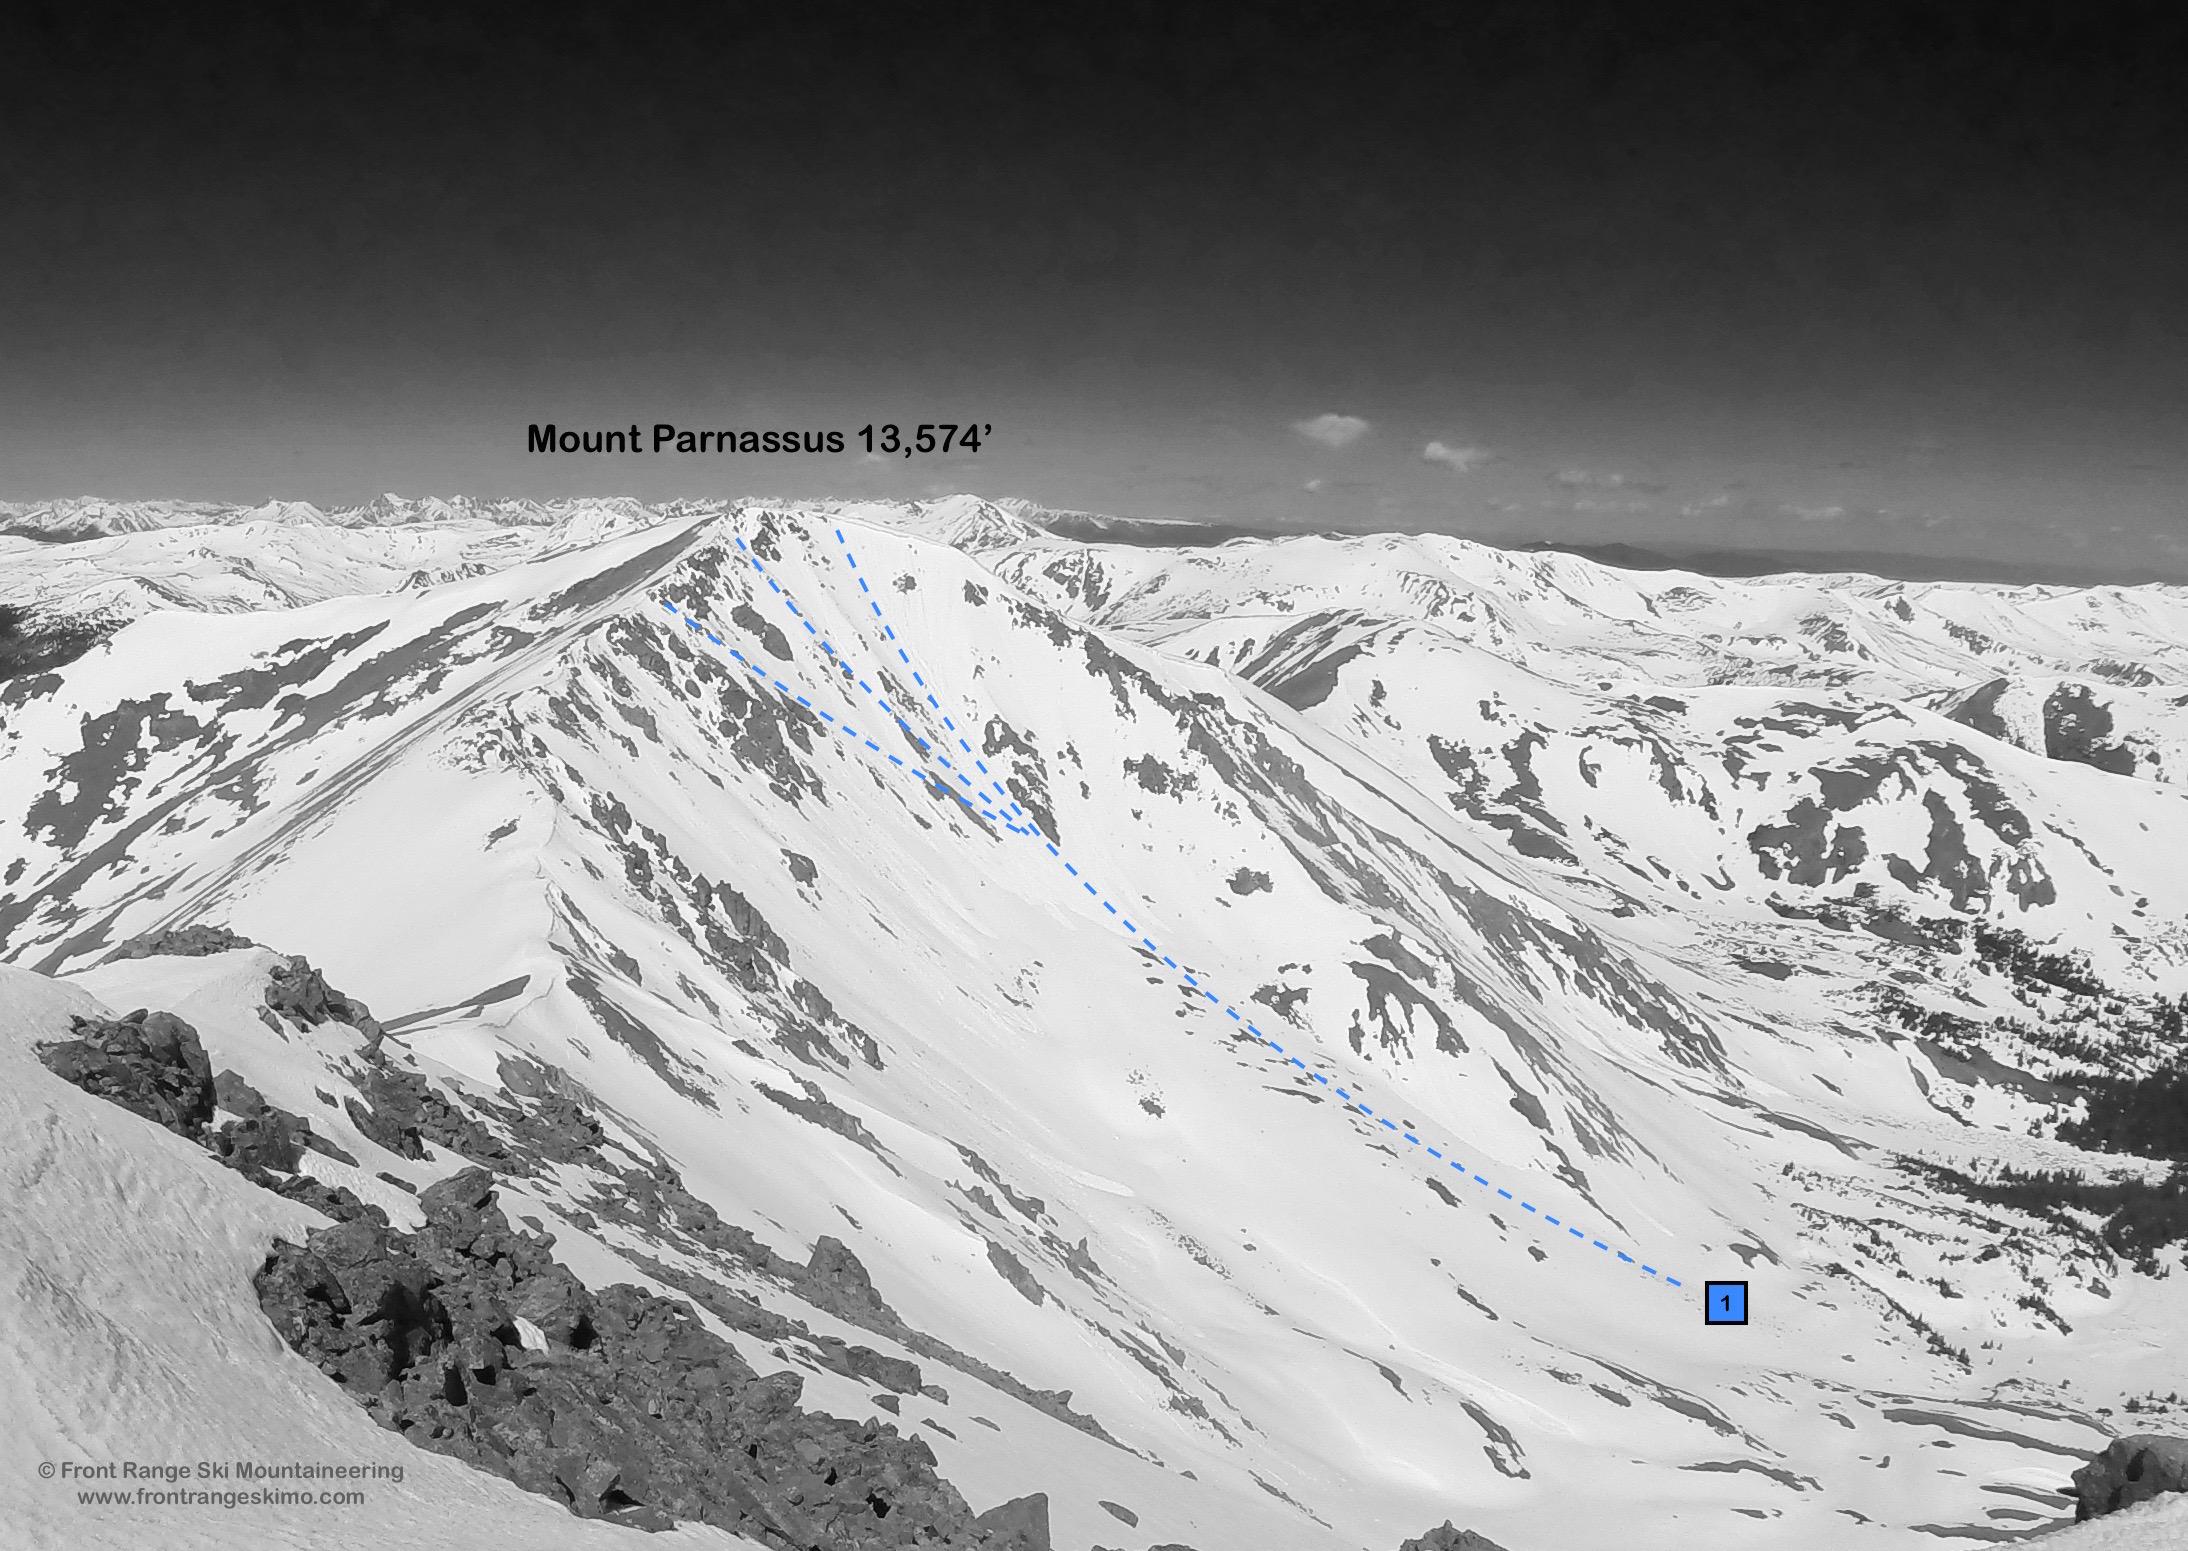 Mount Parnassus Northeast Face